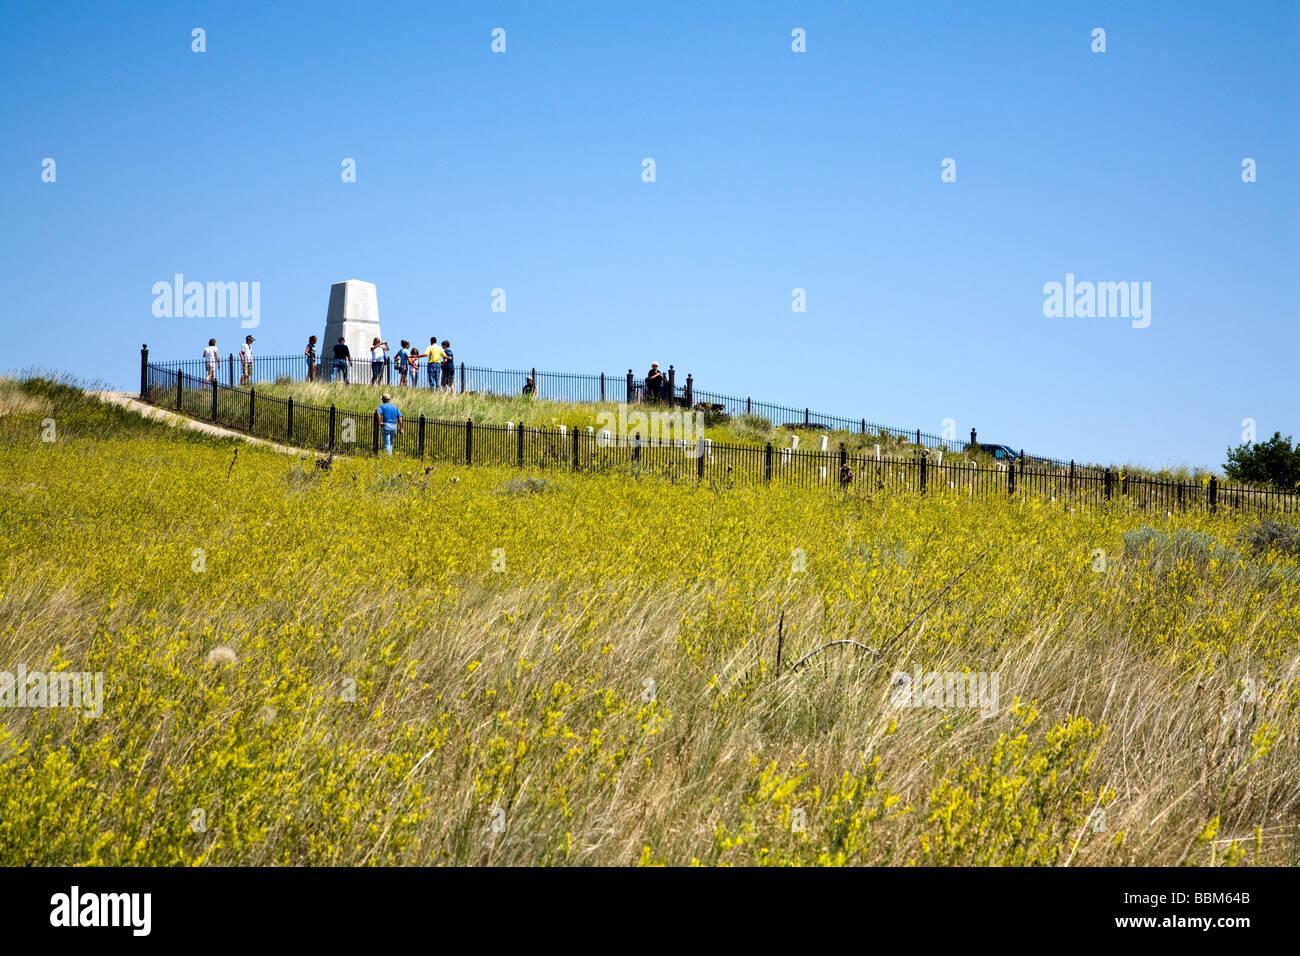 Main battlefield area, Little Bighorn Battlefield National Monument, Montana, USA. Custer's Last Stand. Stock Photo